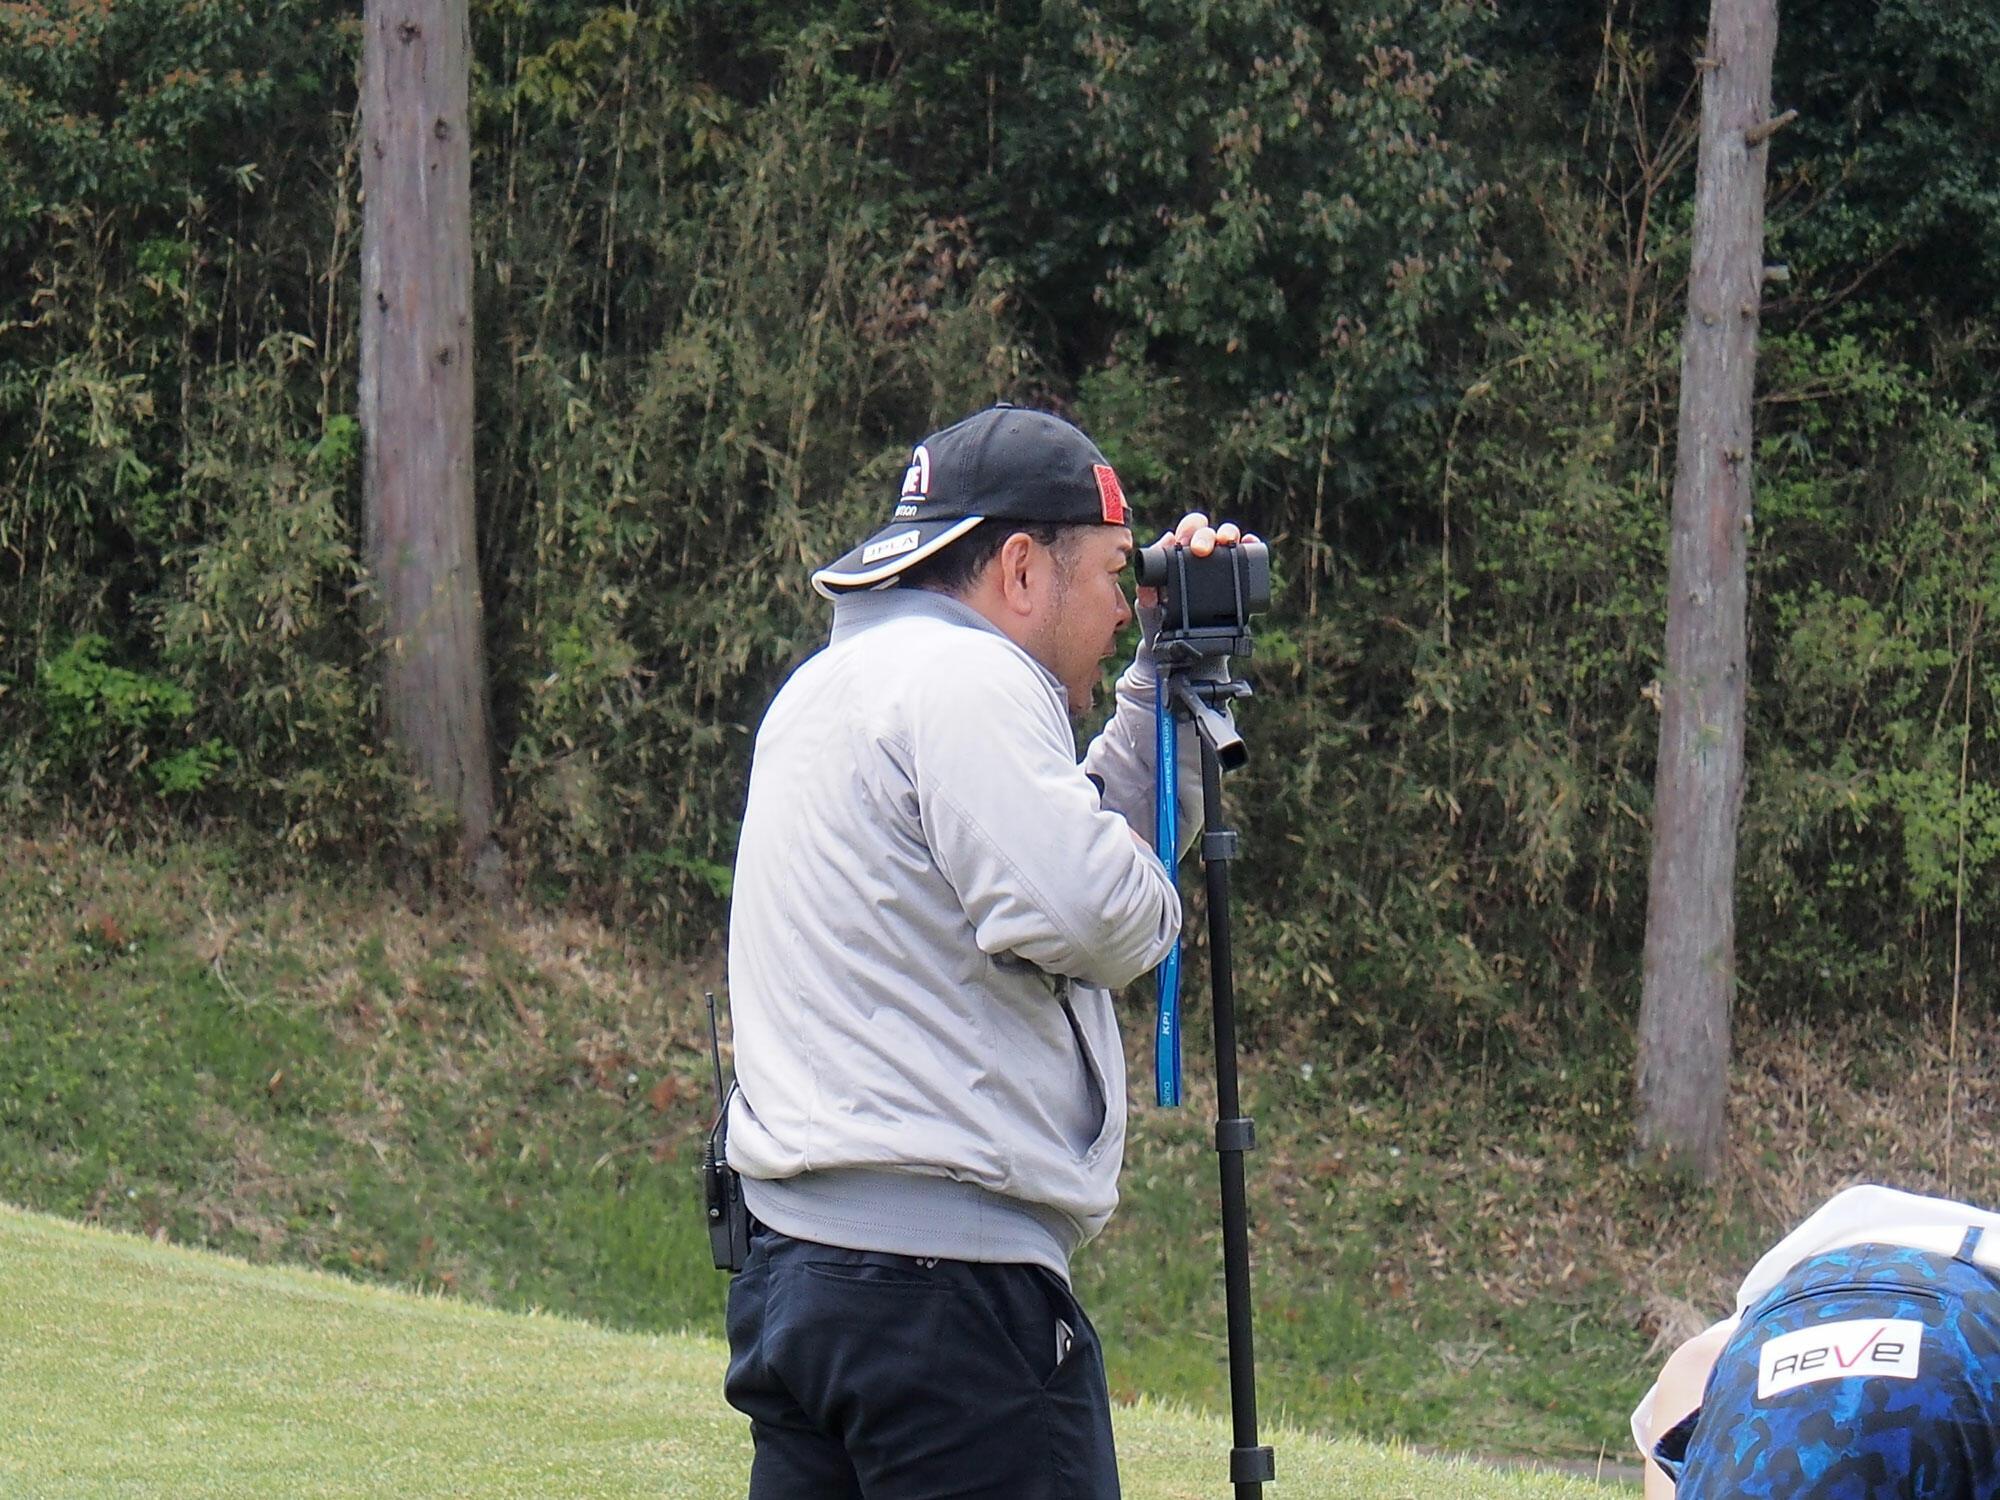 https://www.kenko-tokina.co.jp/mt-images/golfjapan2.jpg